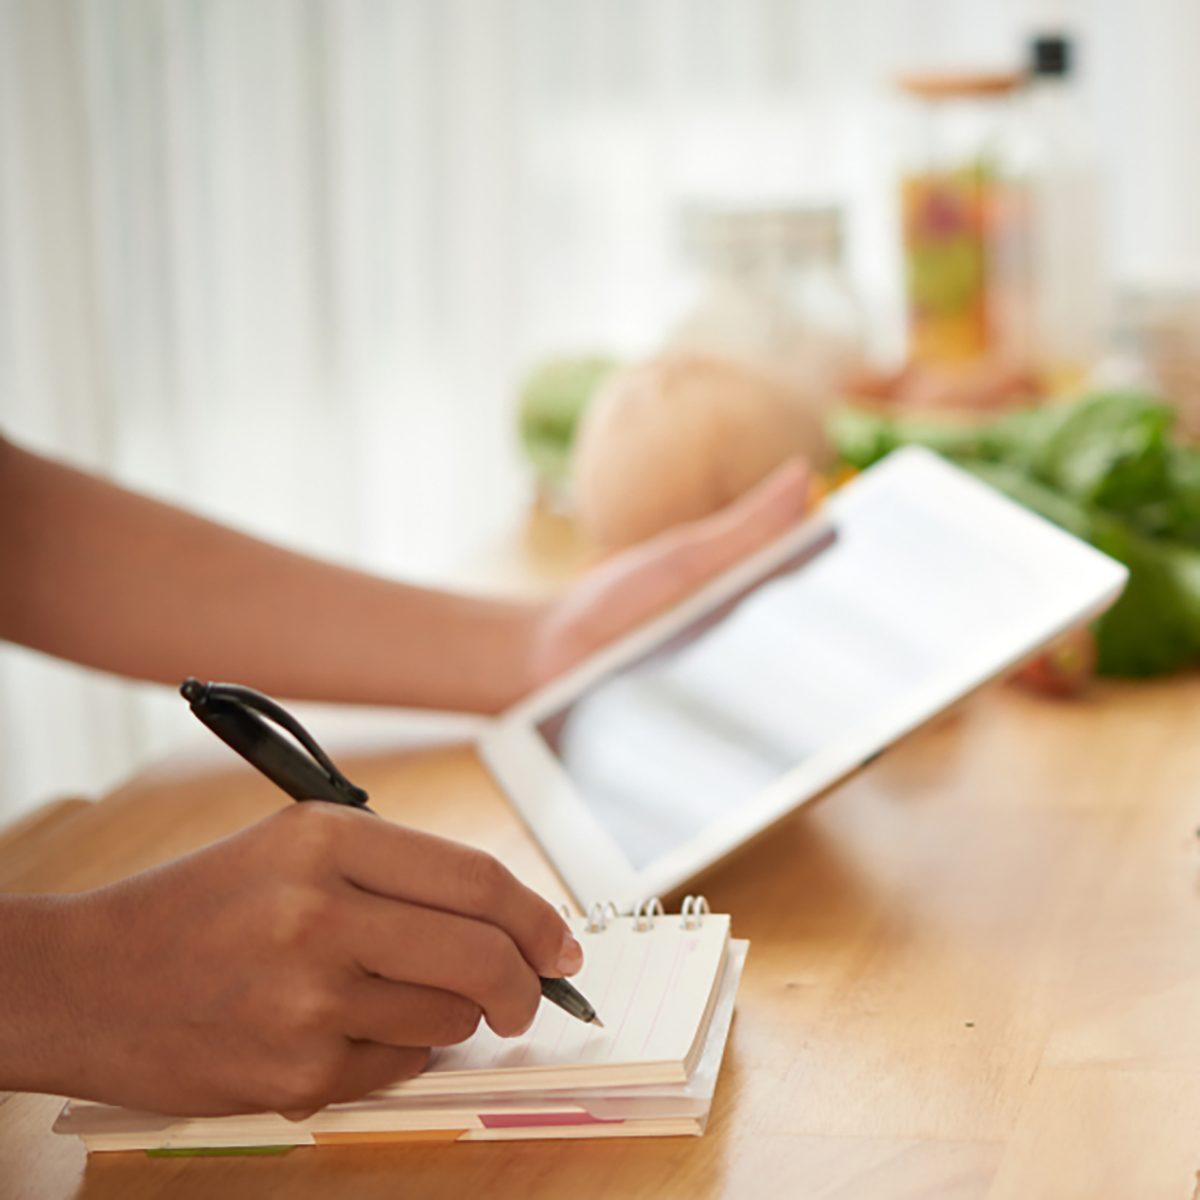 Hands of woman composing healthy menu for upcoming week;